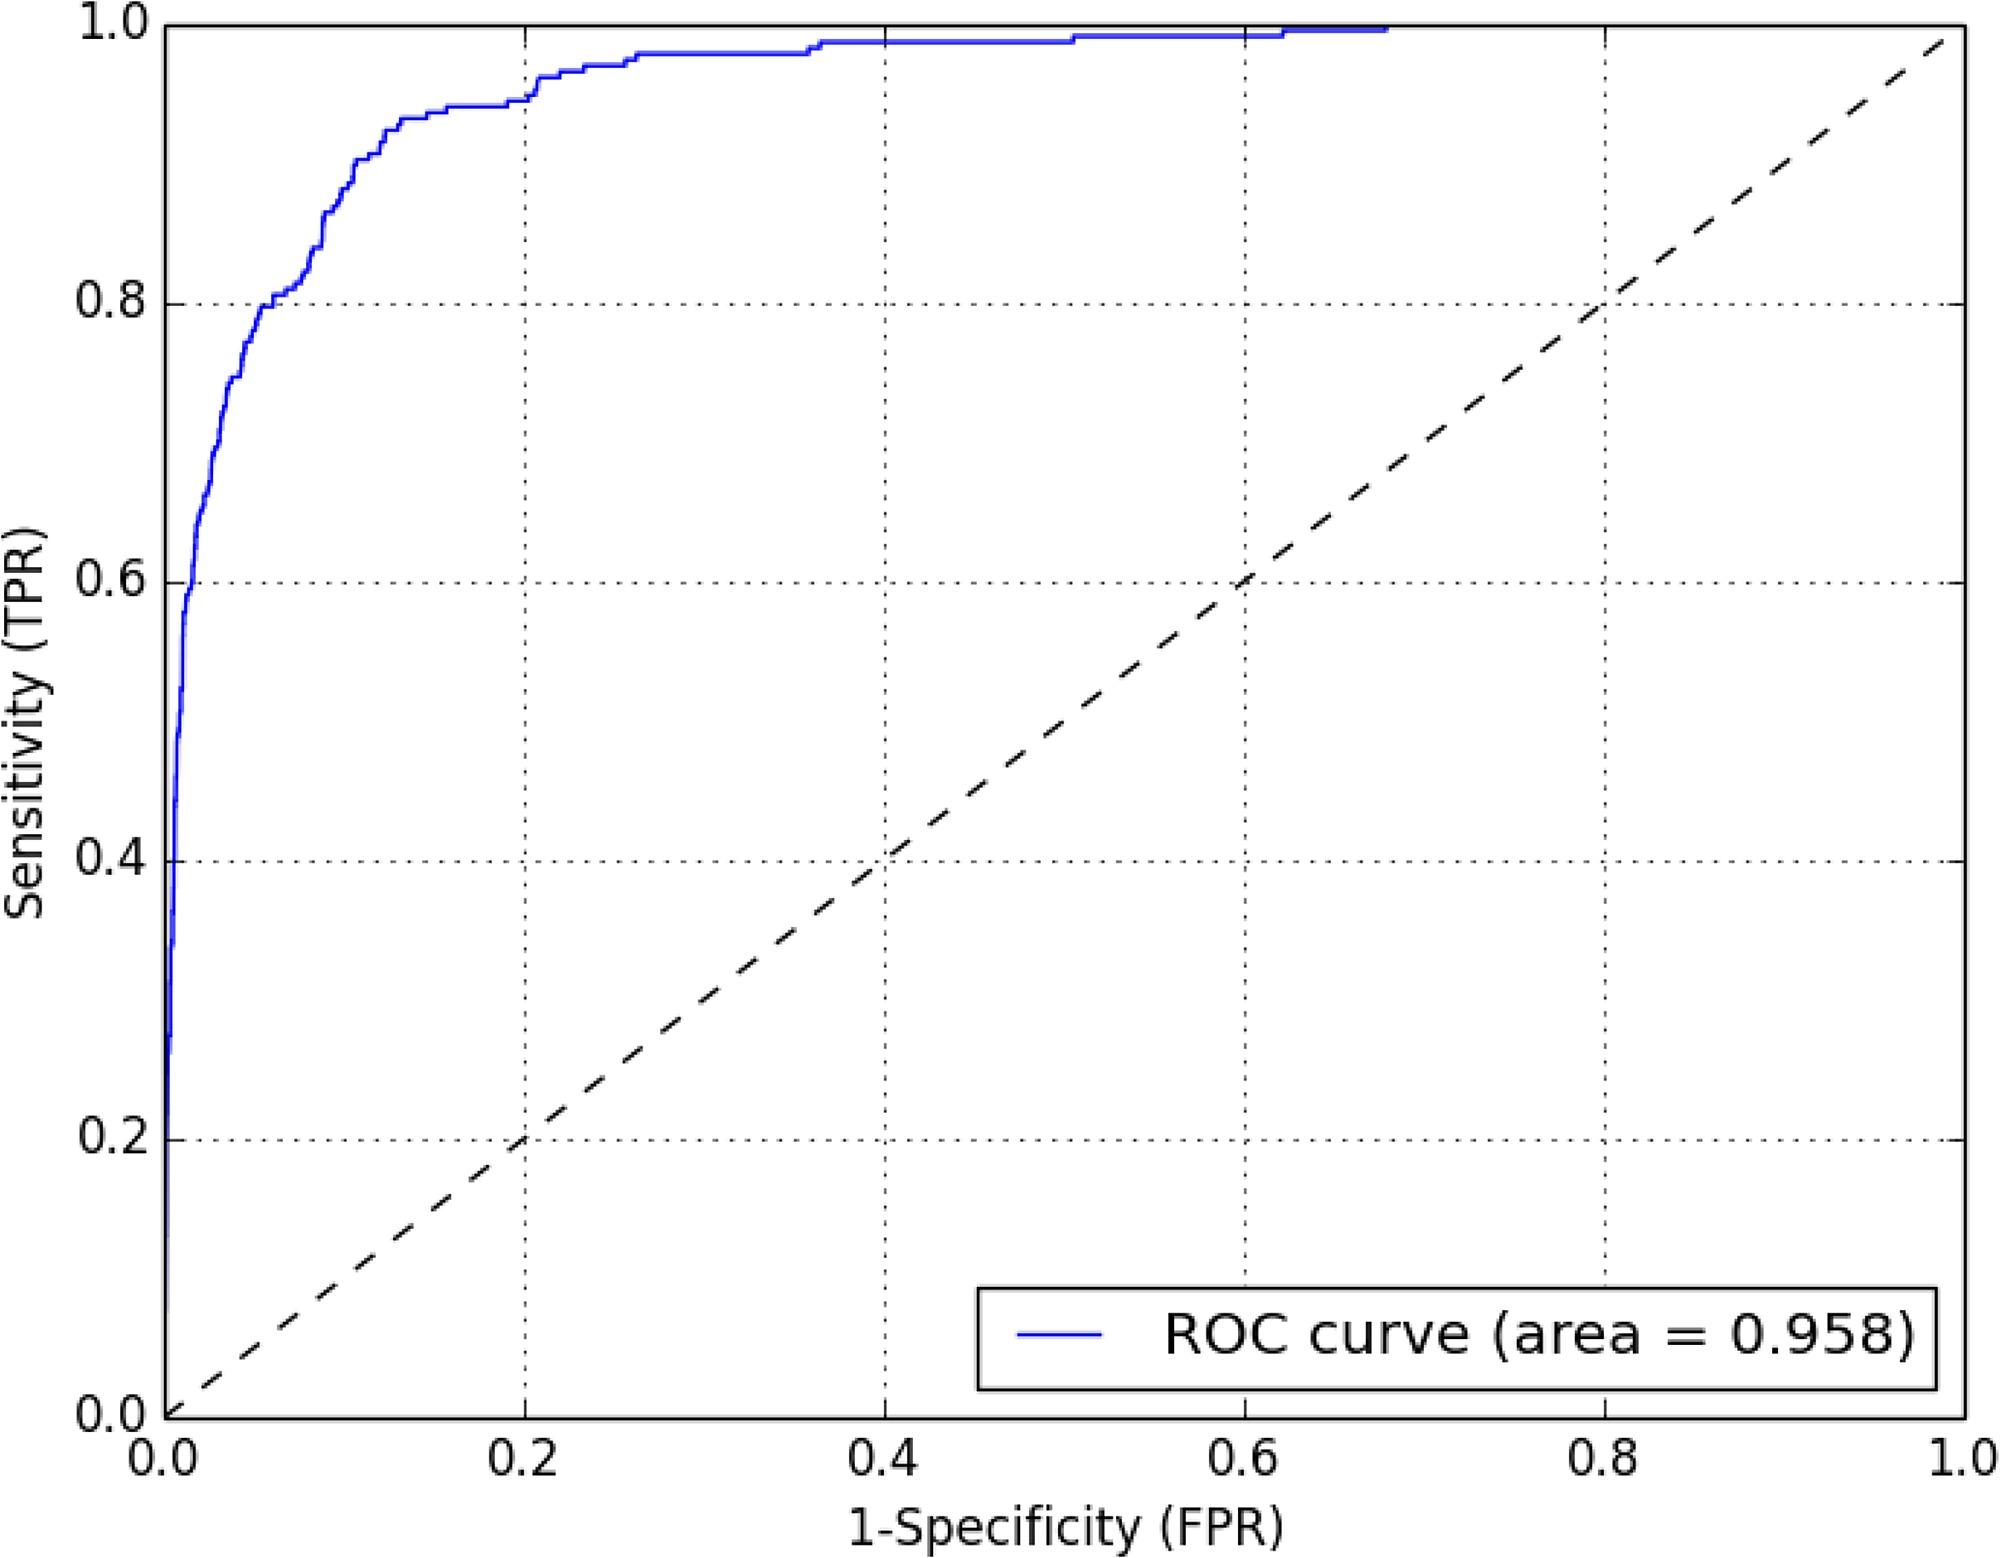 Cosine similarity Receiver Operating Characteristic (ROC) curve